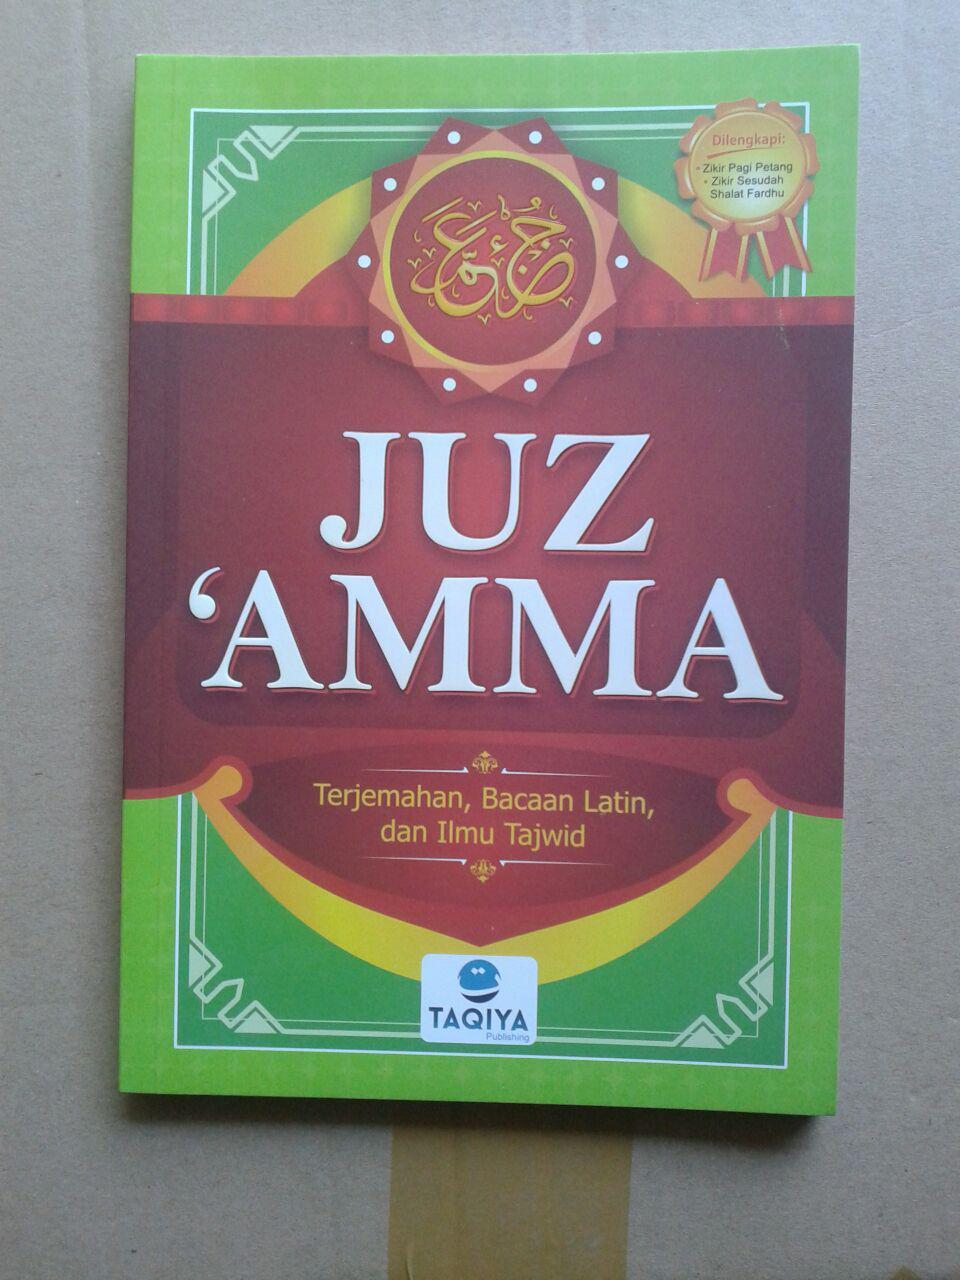 Buku Juz Amma Terjemahan Bacaan Latin Dan Ilmu Tajwid cover 2